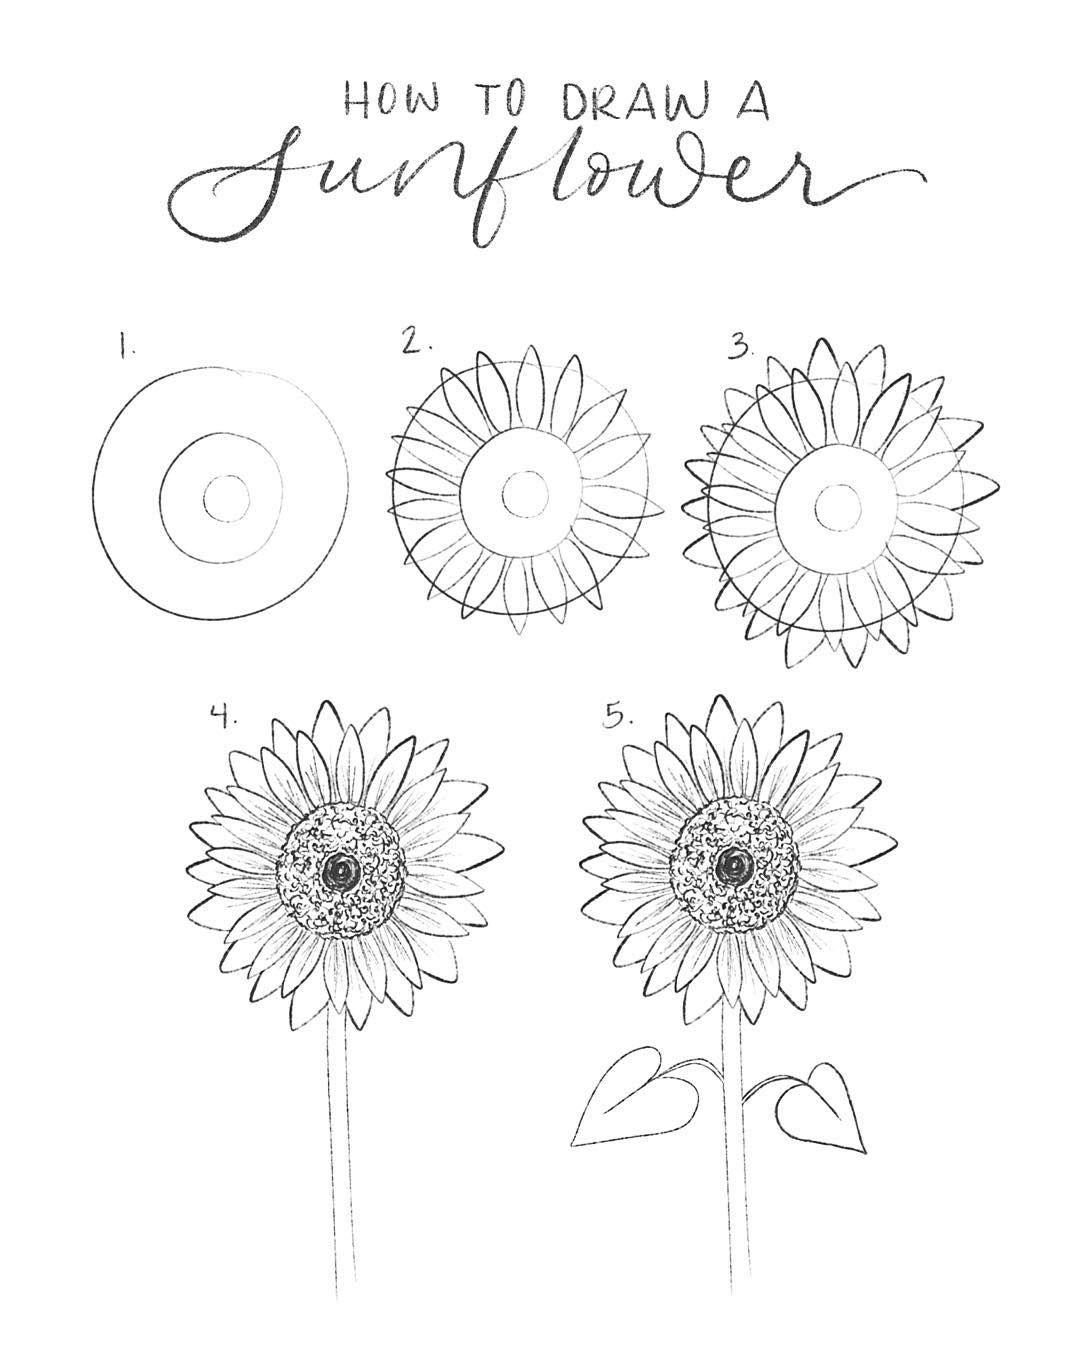 Sunflower Cartoon Drawing : sunflower, cartoon, drawing, Sunflower, Doodle, Flower, Drawings,, Drawing, Tutorials,